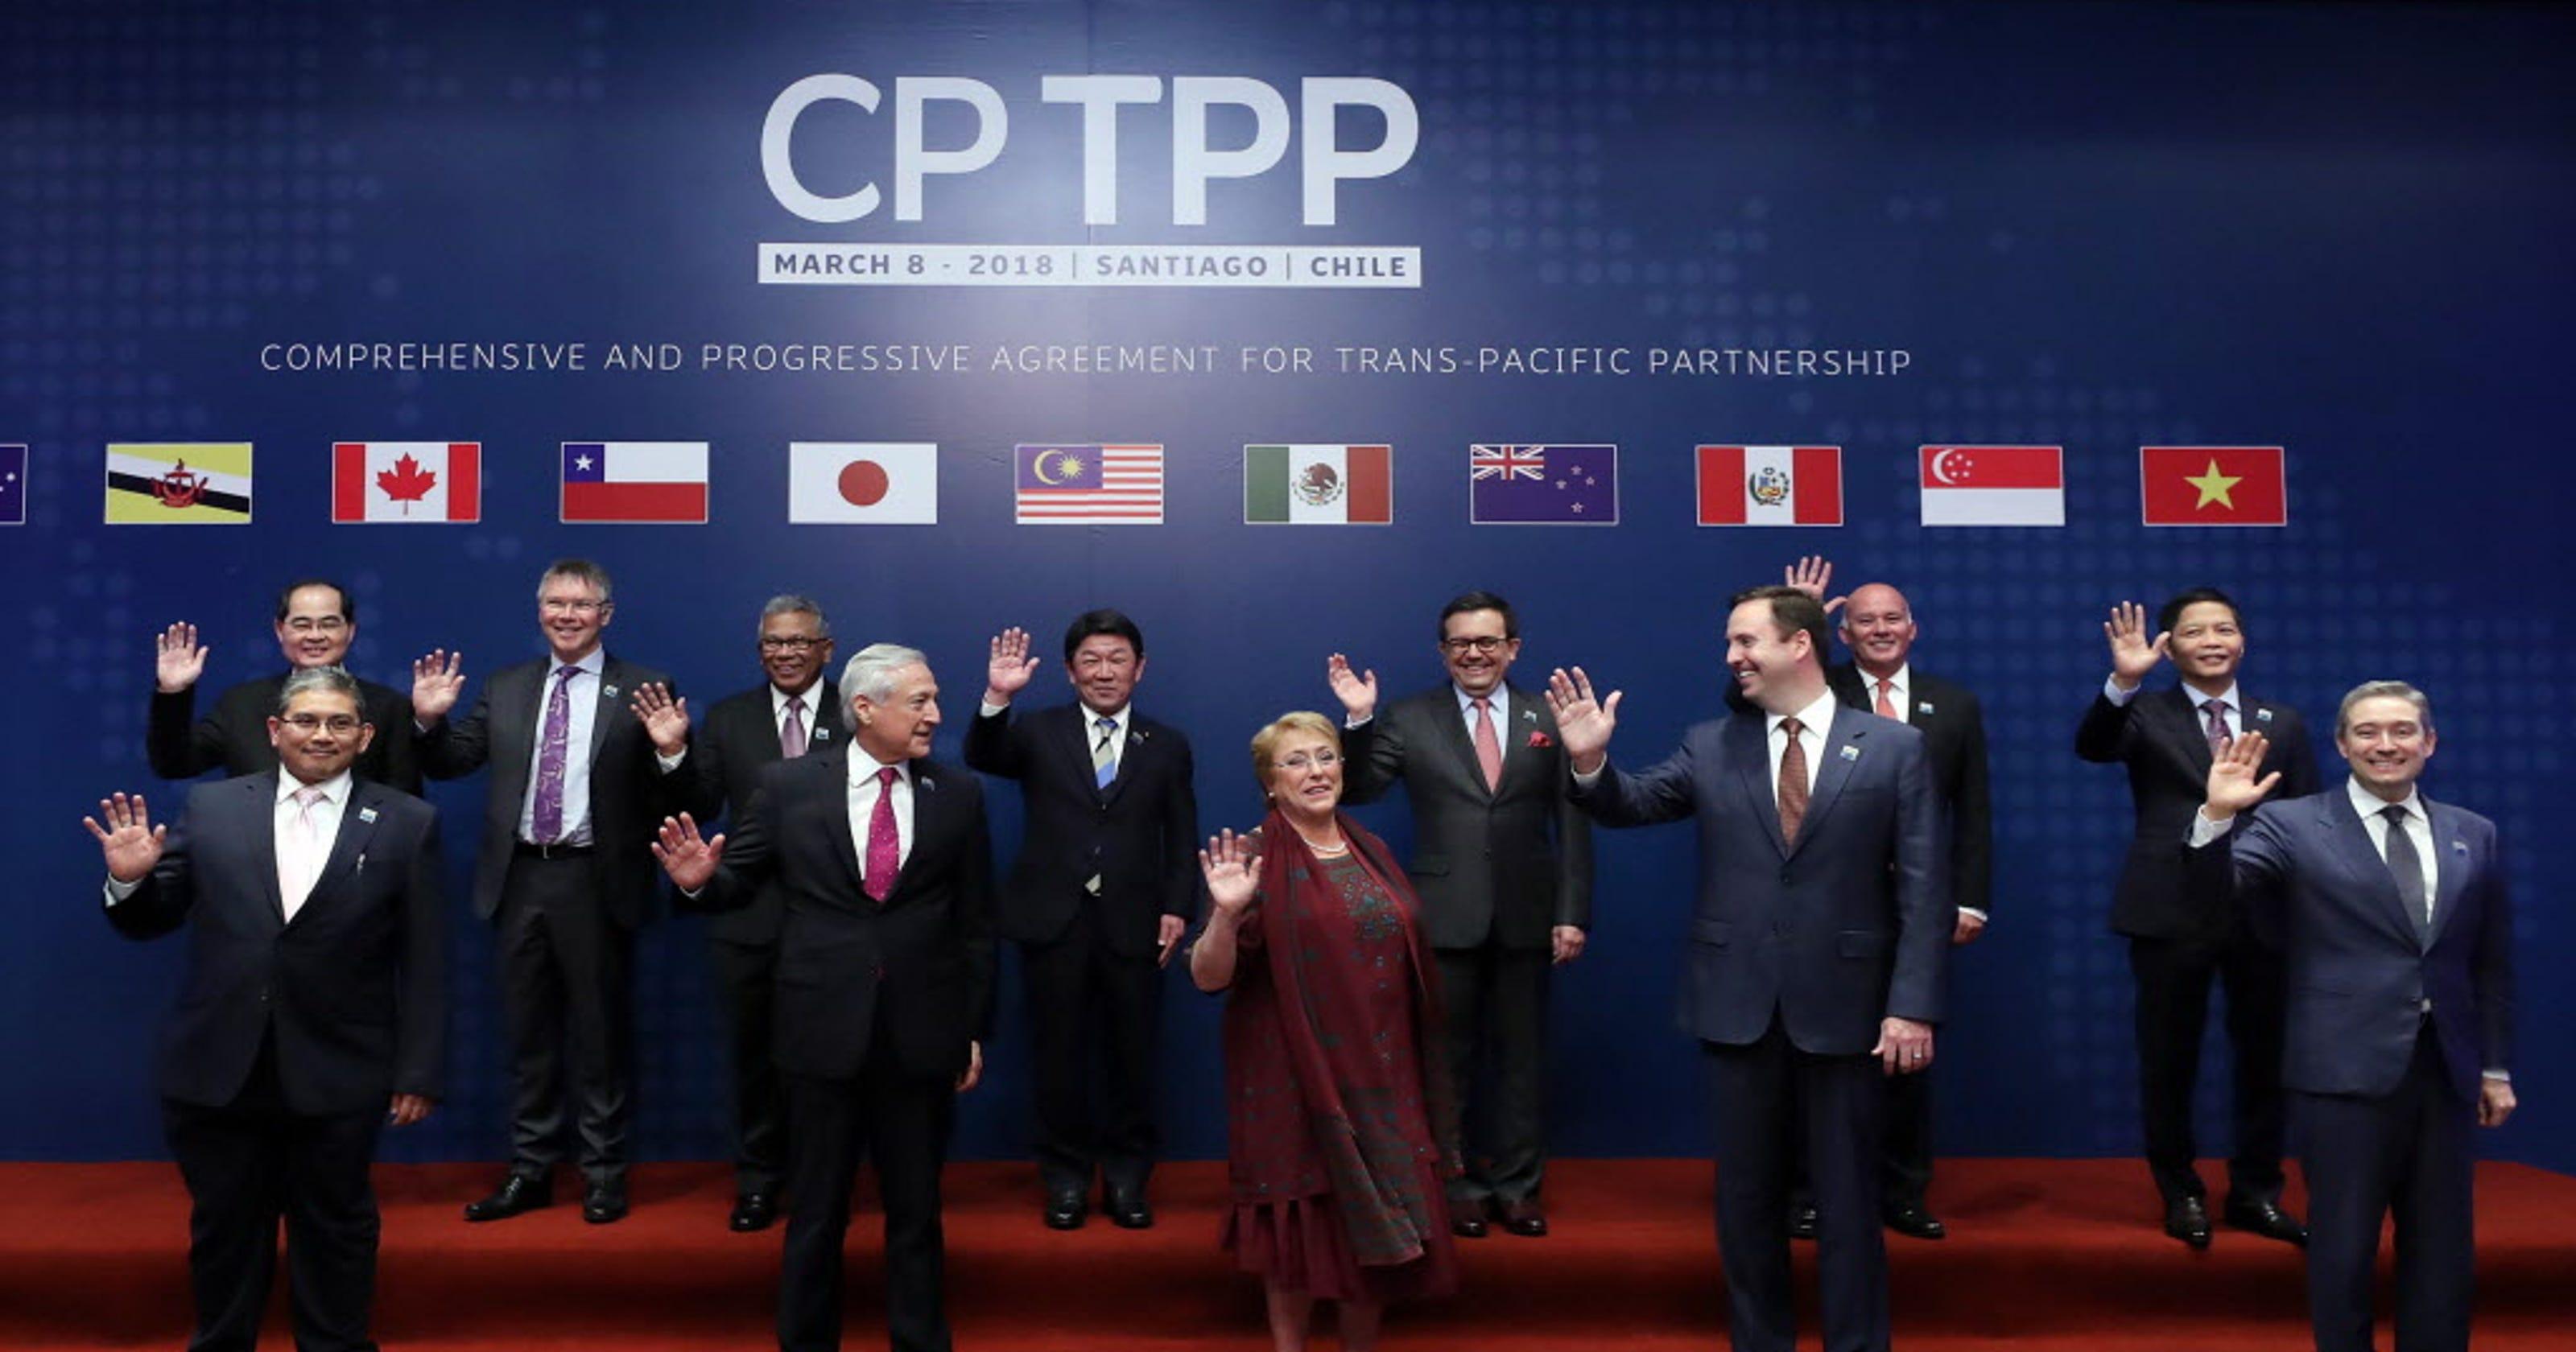 President Donald Trump Revive The Tpp To Pressure China And Maga